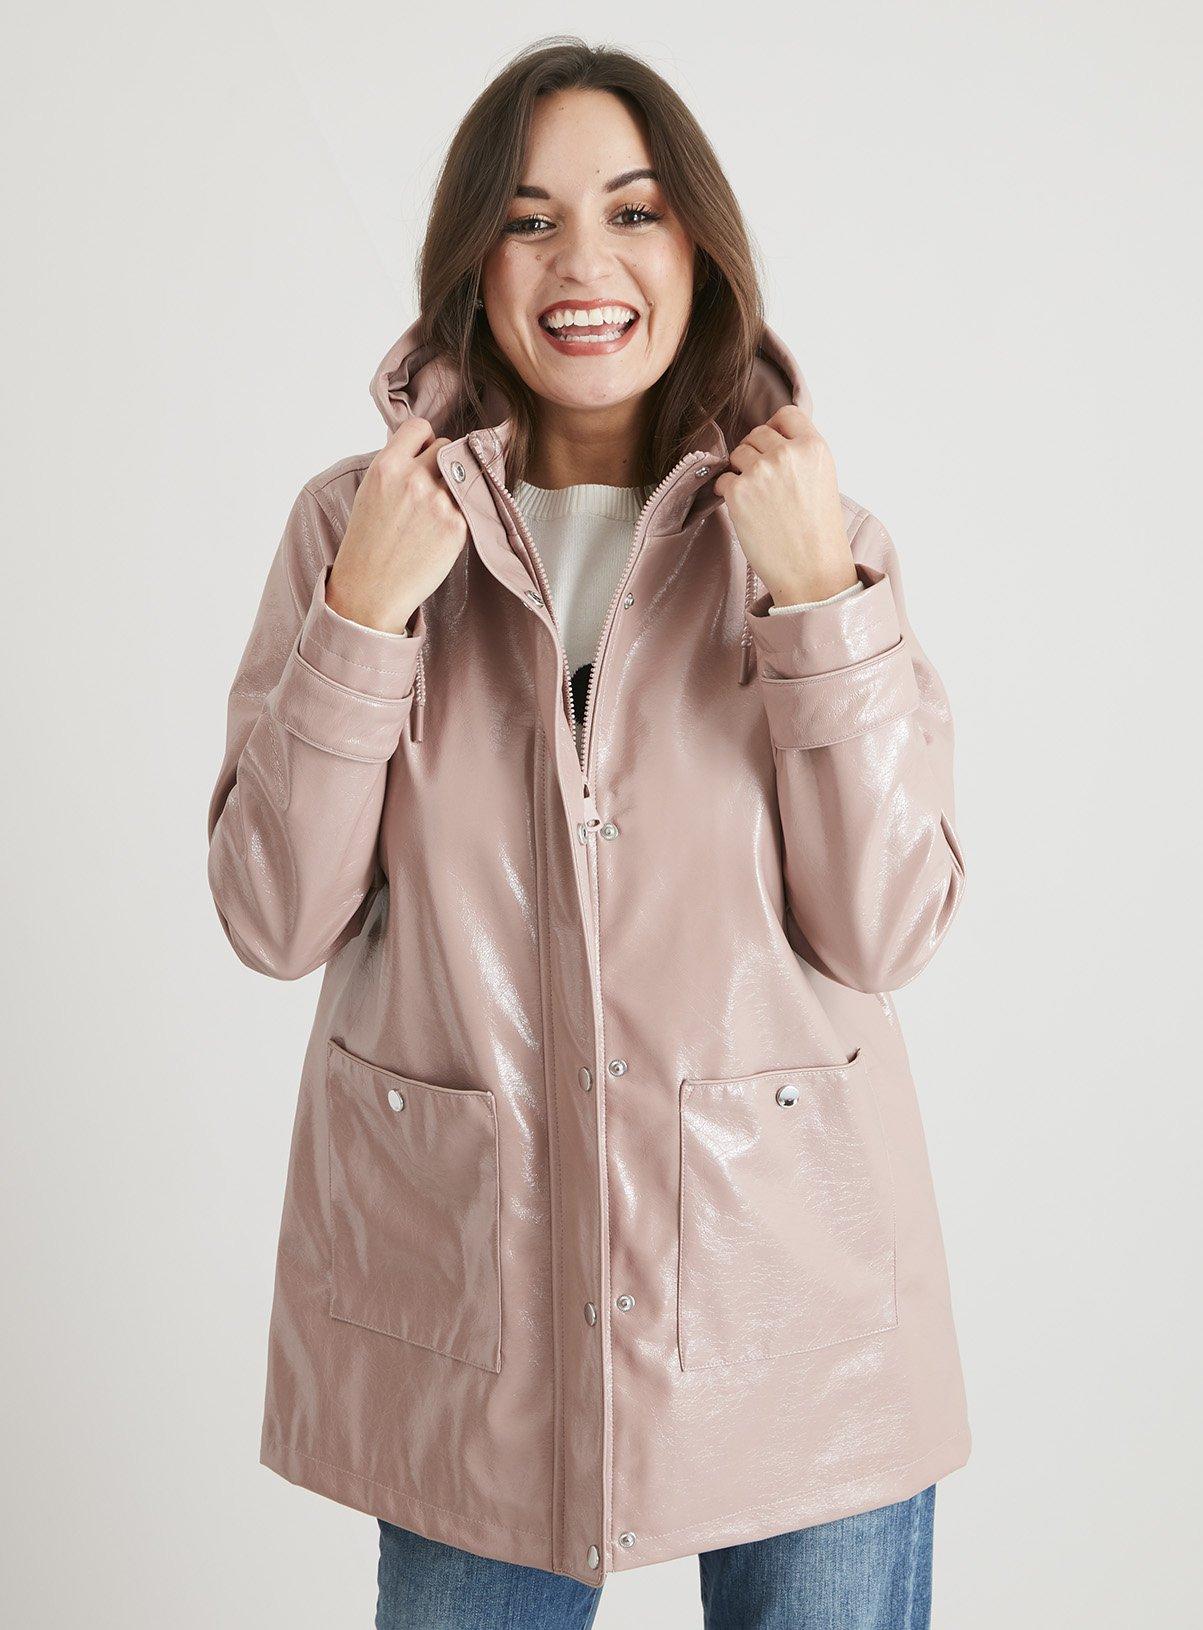 Pink Shower Resistant Vinyl Rubber Raincoat - 24